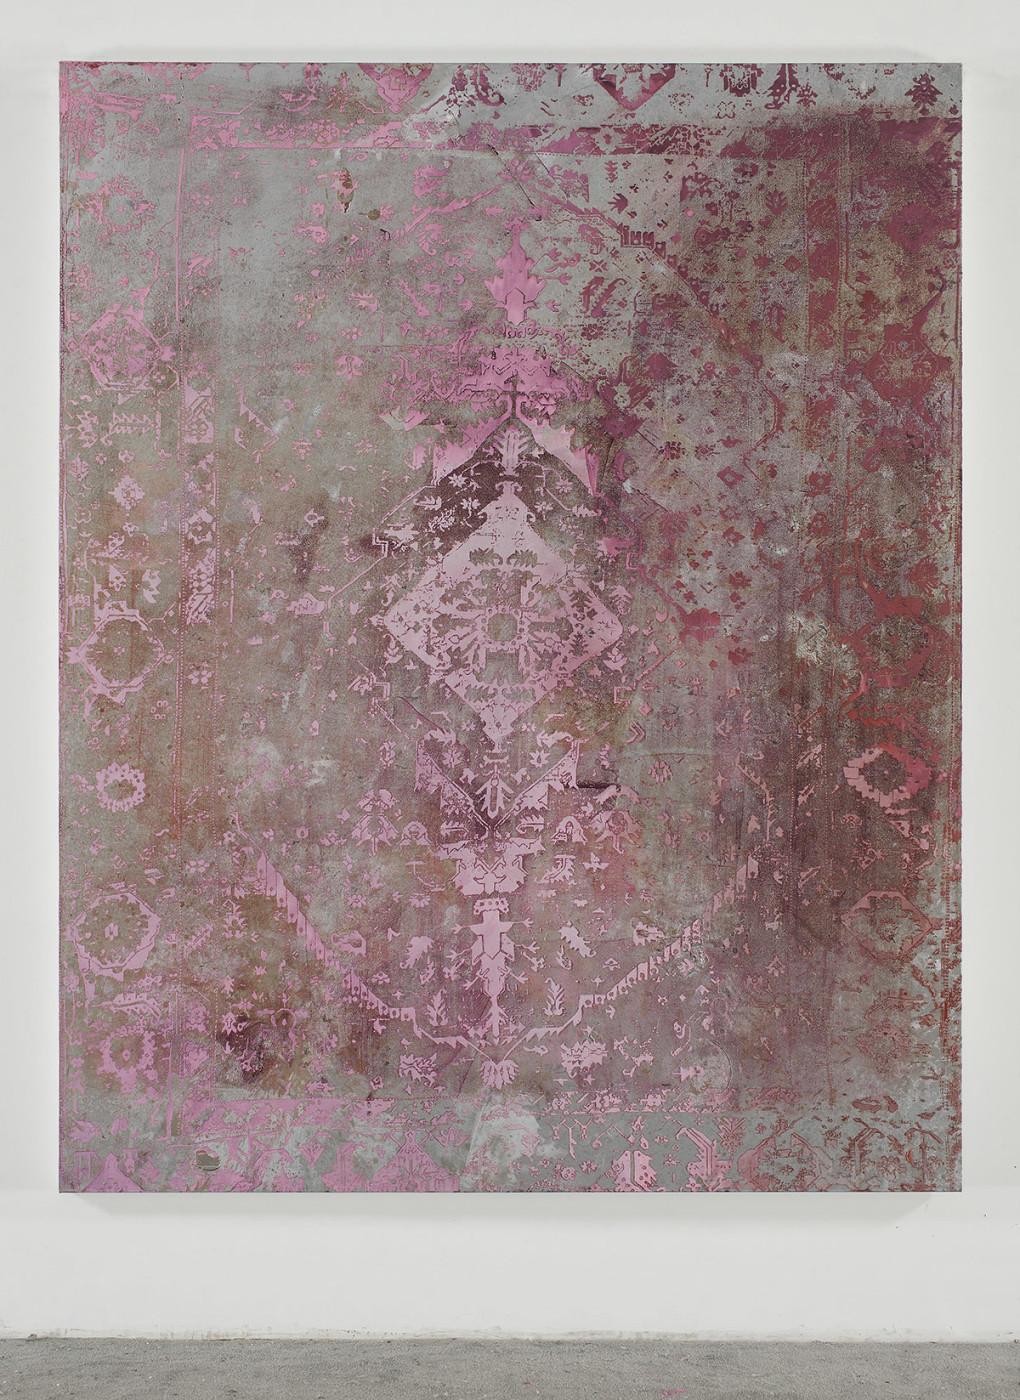 "<div class=""title""><em>Untitled</em>, 2012</div><div class=""medium"">oil and enamel on canvas</div><div class=""dimensions"">241.3 x 193.0 x 5.2 cm<br />95 x 76 x 2 in.</div>"